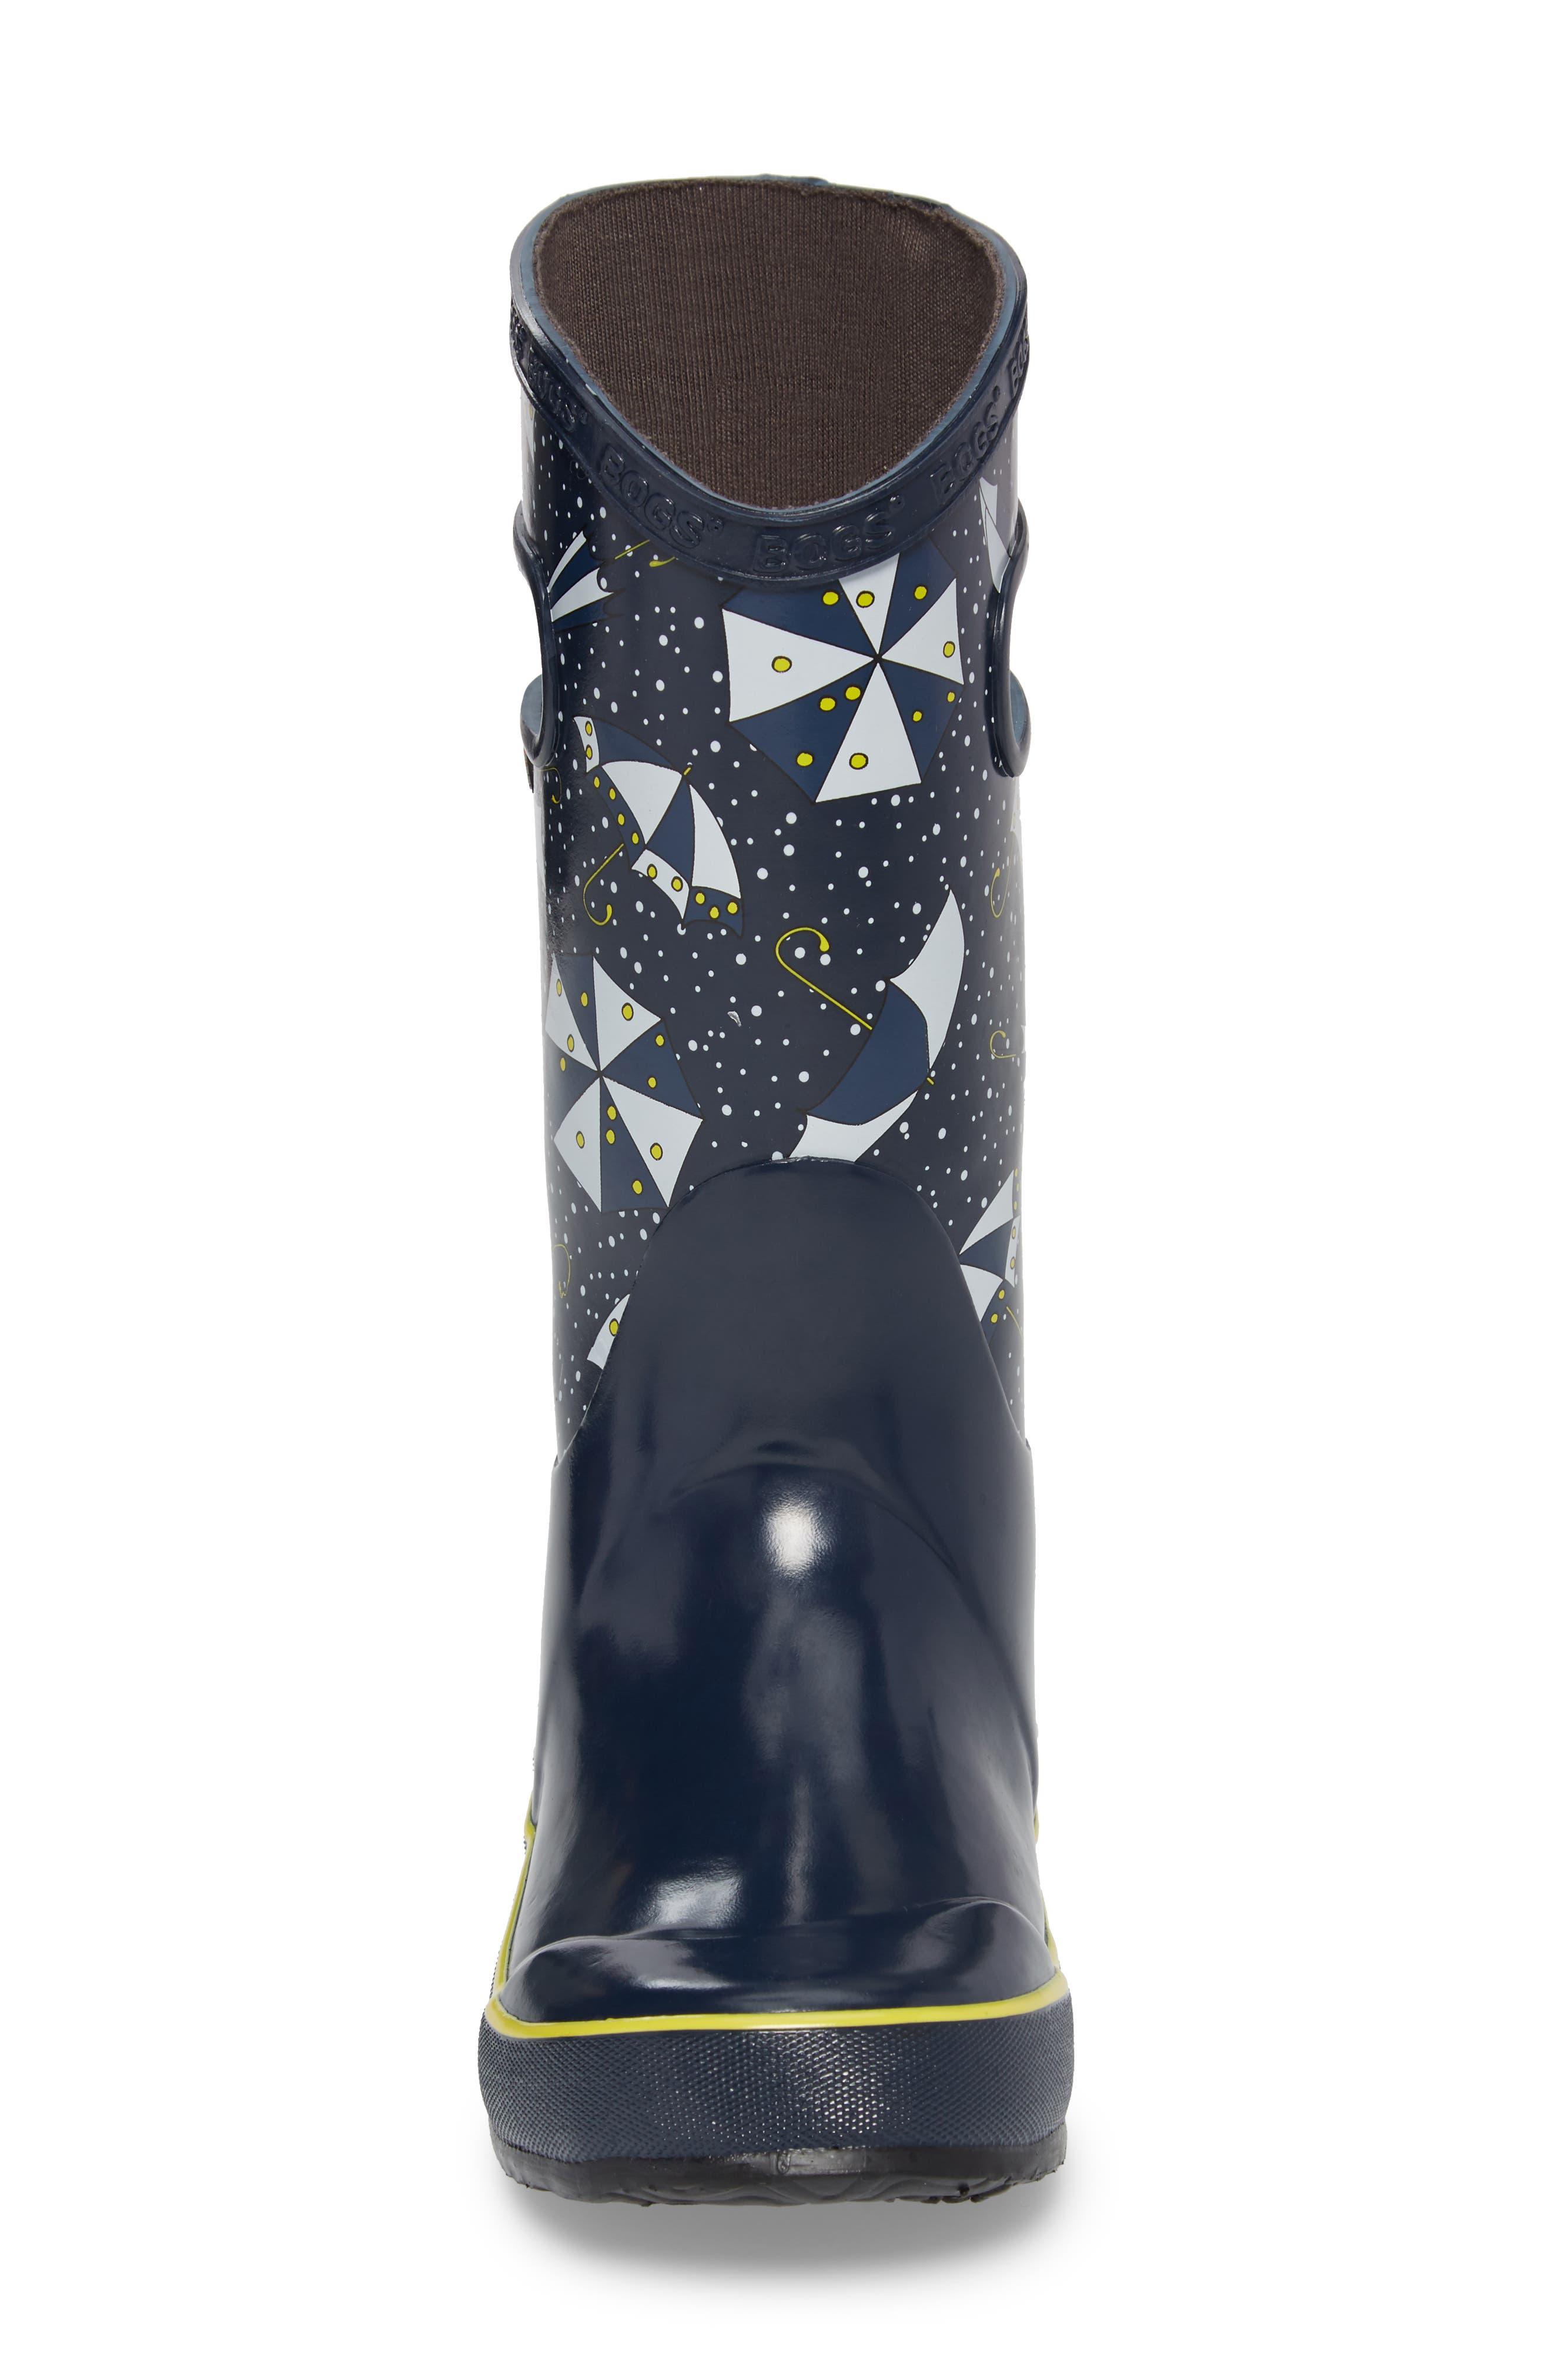 Umbrellas Waterproof Rubber Rain Boot,                             Alternate thumbnail 4, color,                             Dark Blue Multi